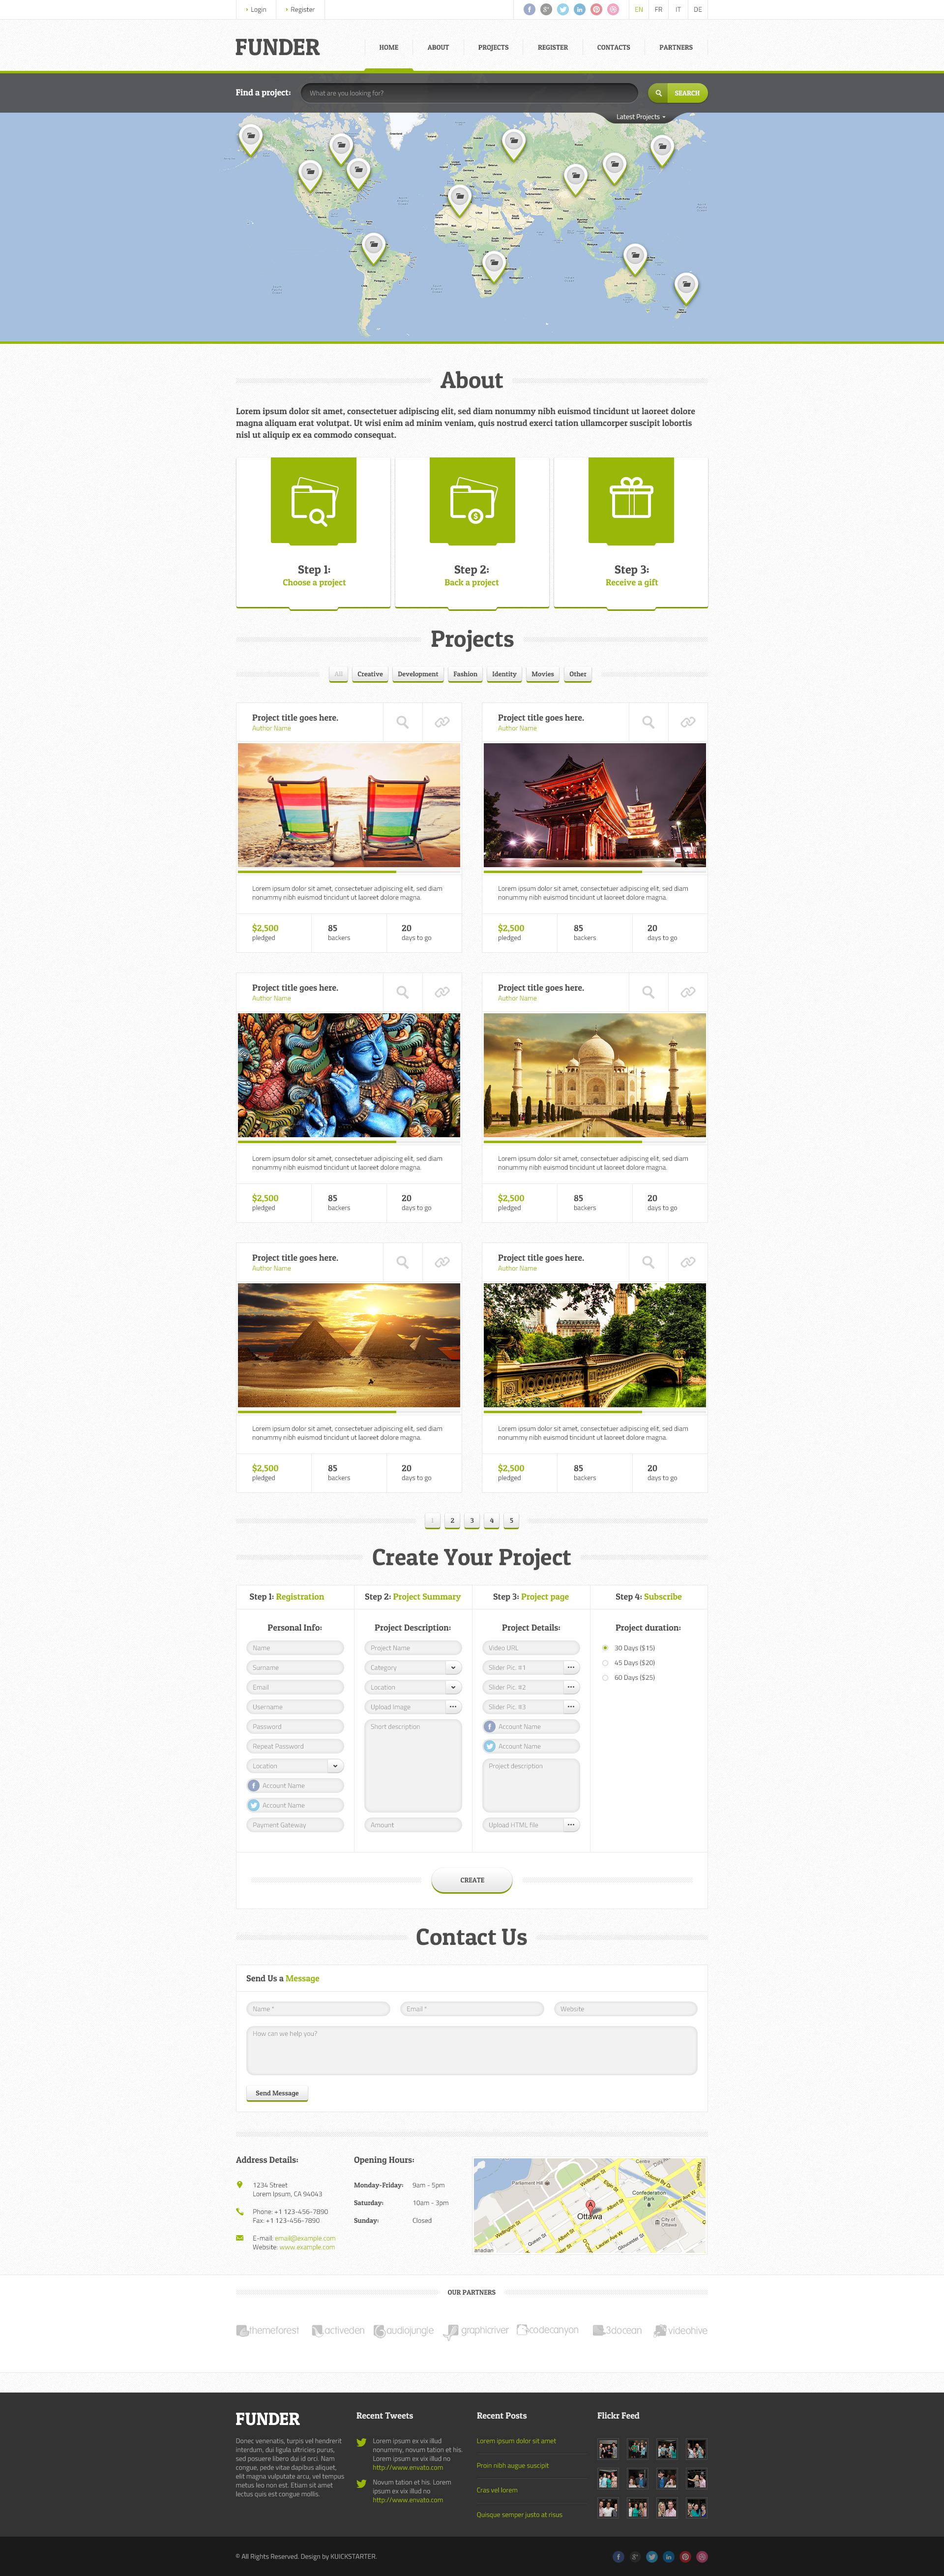 FUNDER - Crowdfunding Wordpress Theme